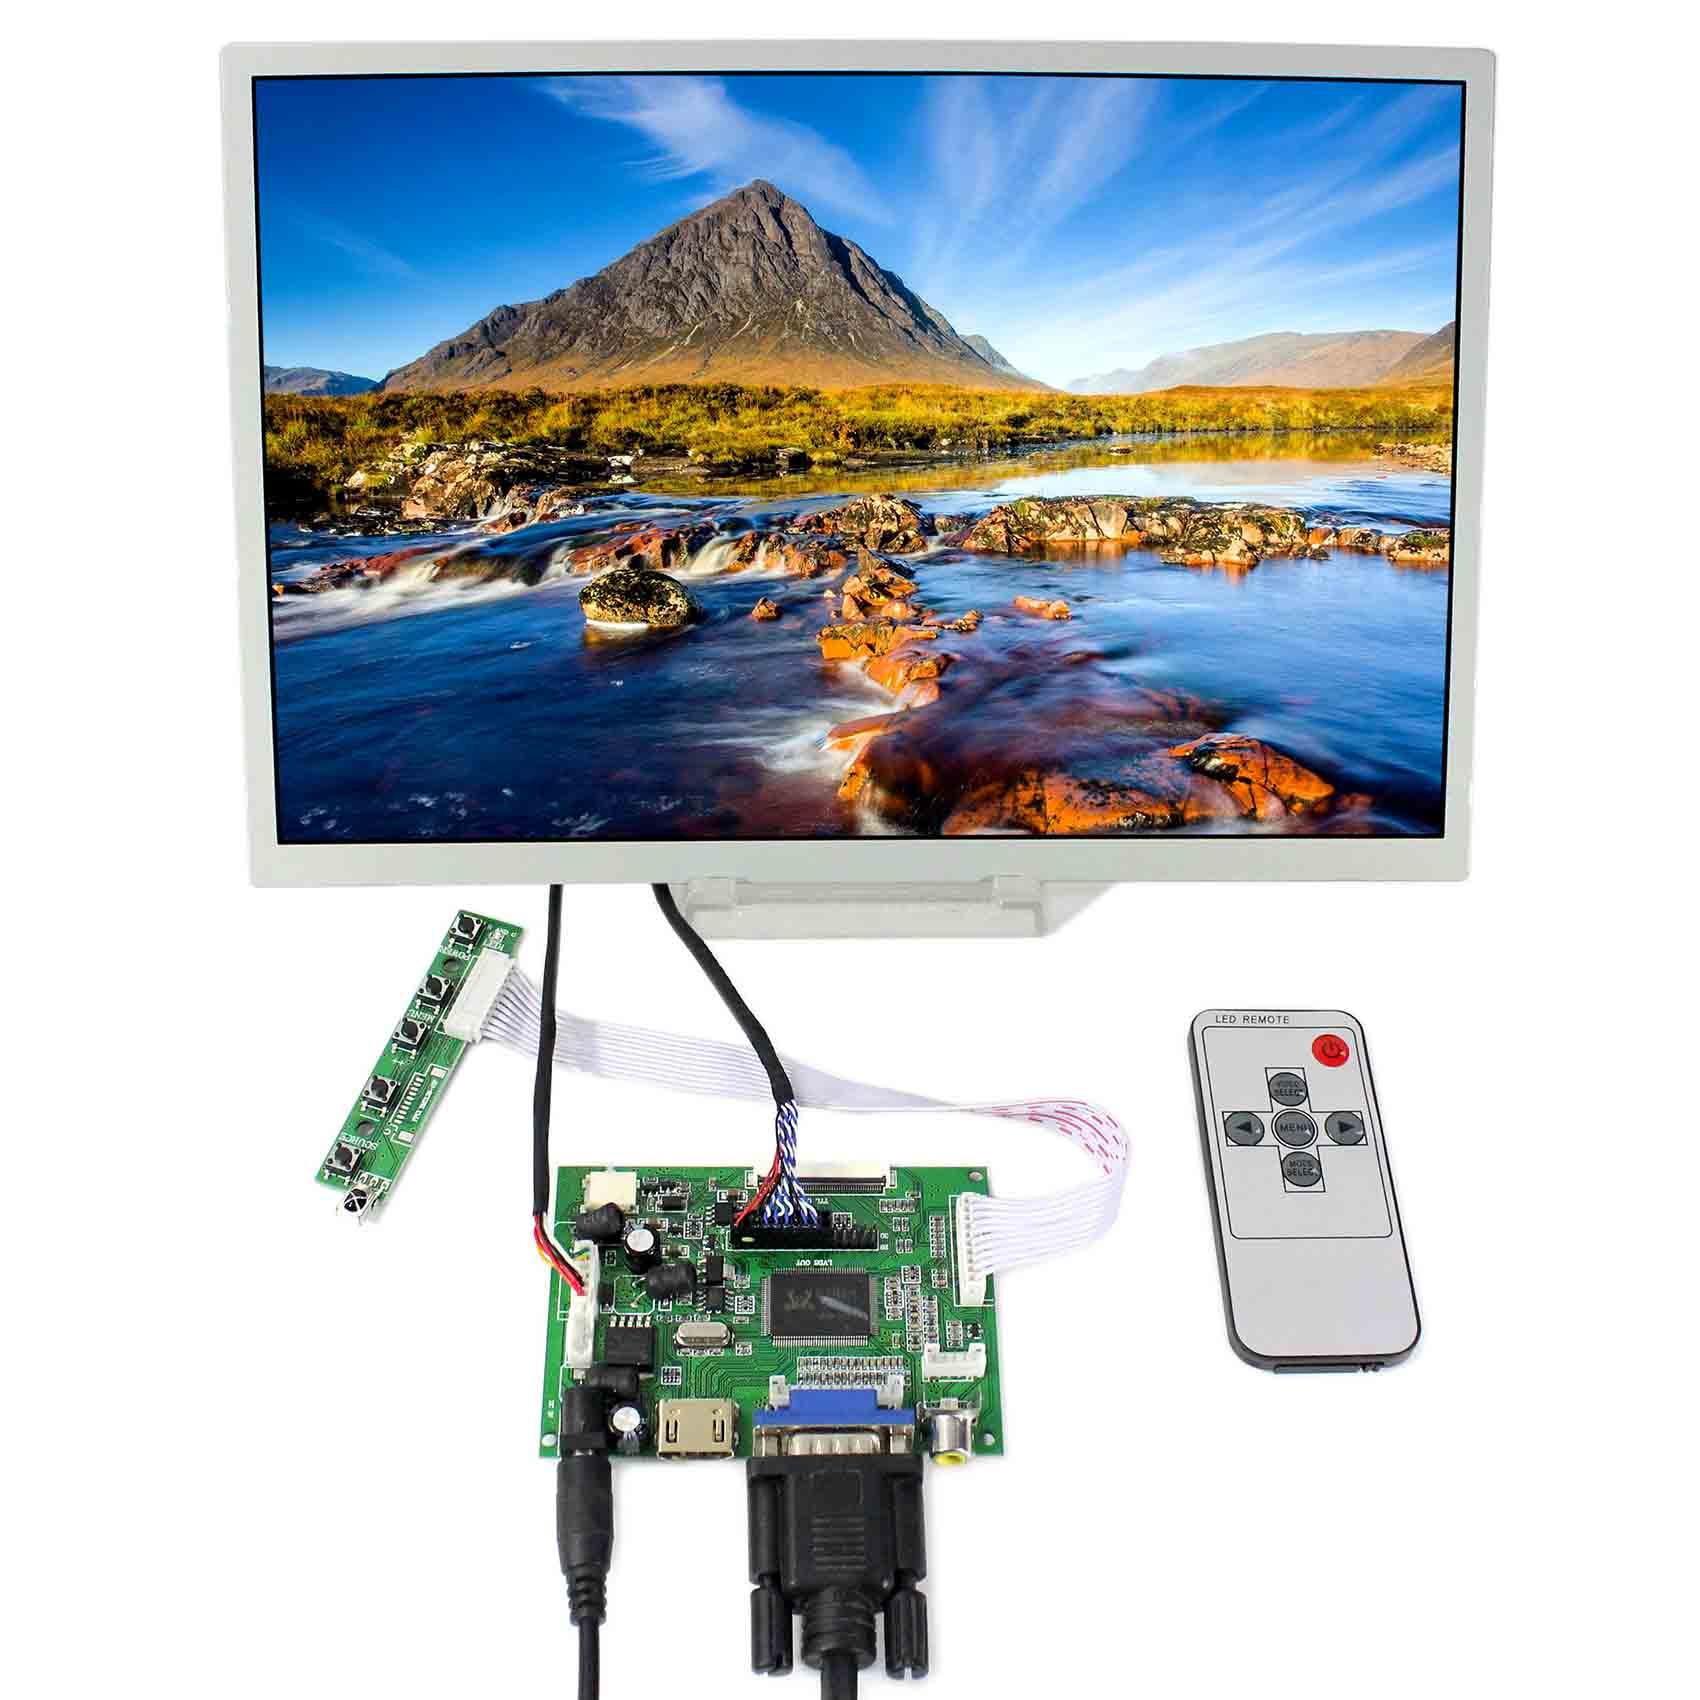 HDMI+VGA+2AV LCD Controller Board With 12.1inch 1280x800 LQ121K1LG52 LCD Screen vga hdmi lcd controller board for lp156whu tpb1 lp156whu tpa1 lp156whu tpbh lp156whu tpd1 15 6 inch edp 30 pins 1 lane 1366x768